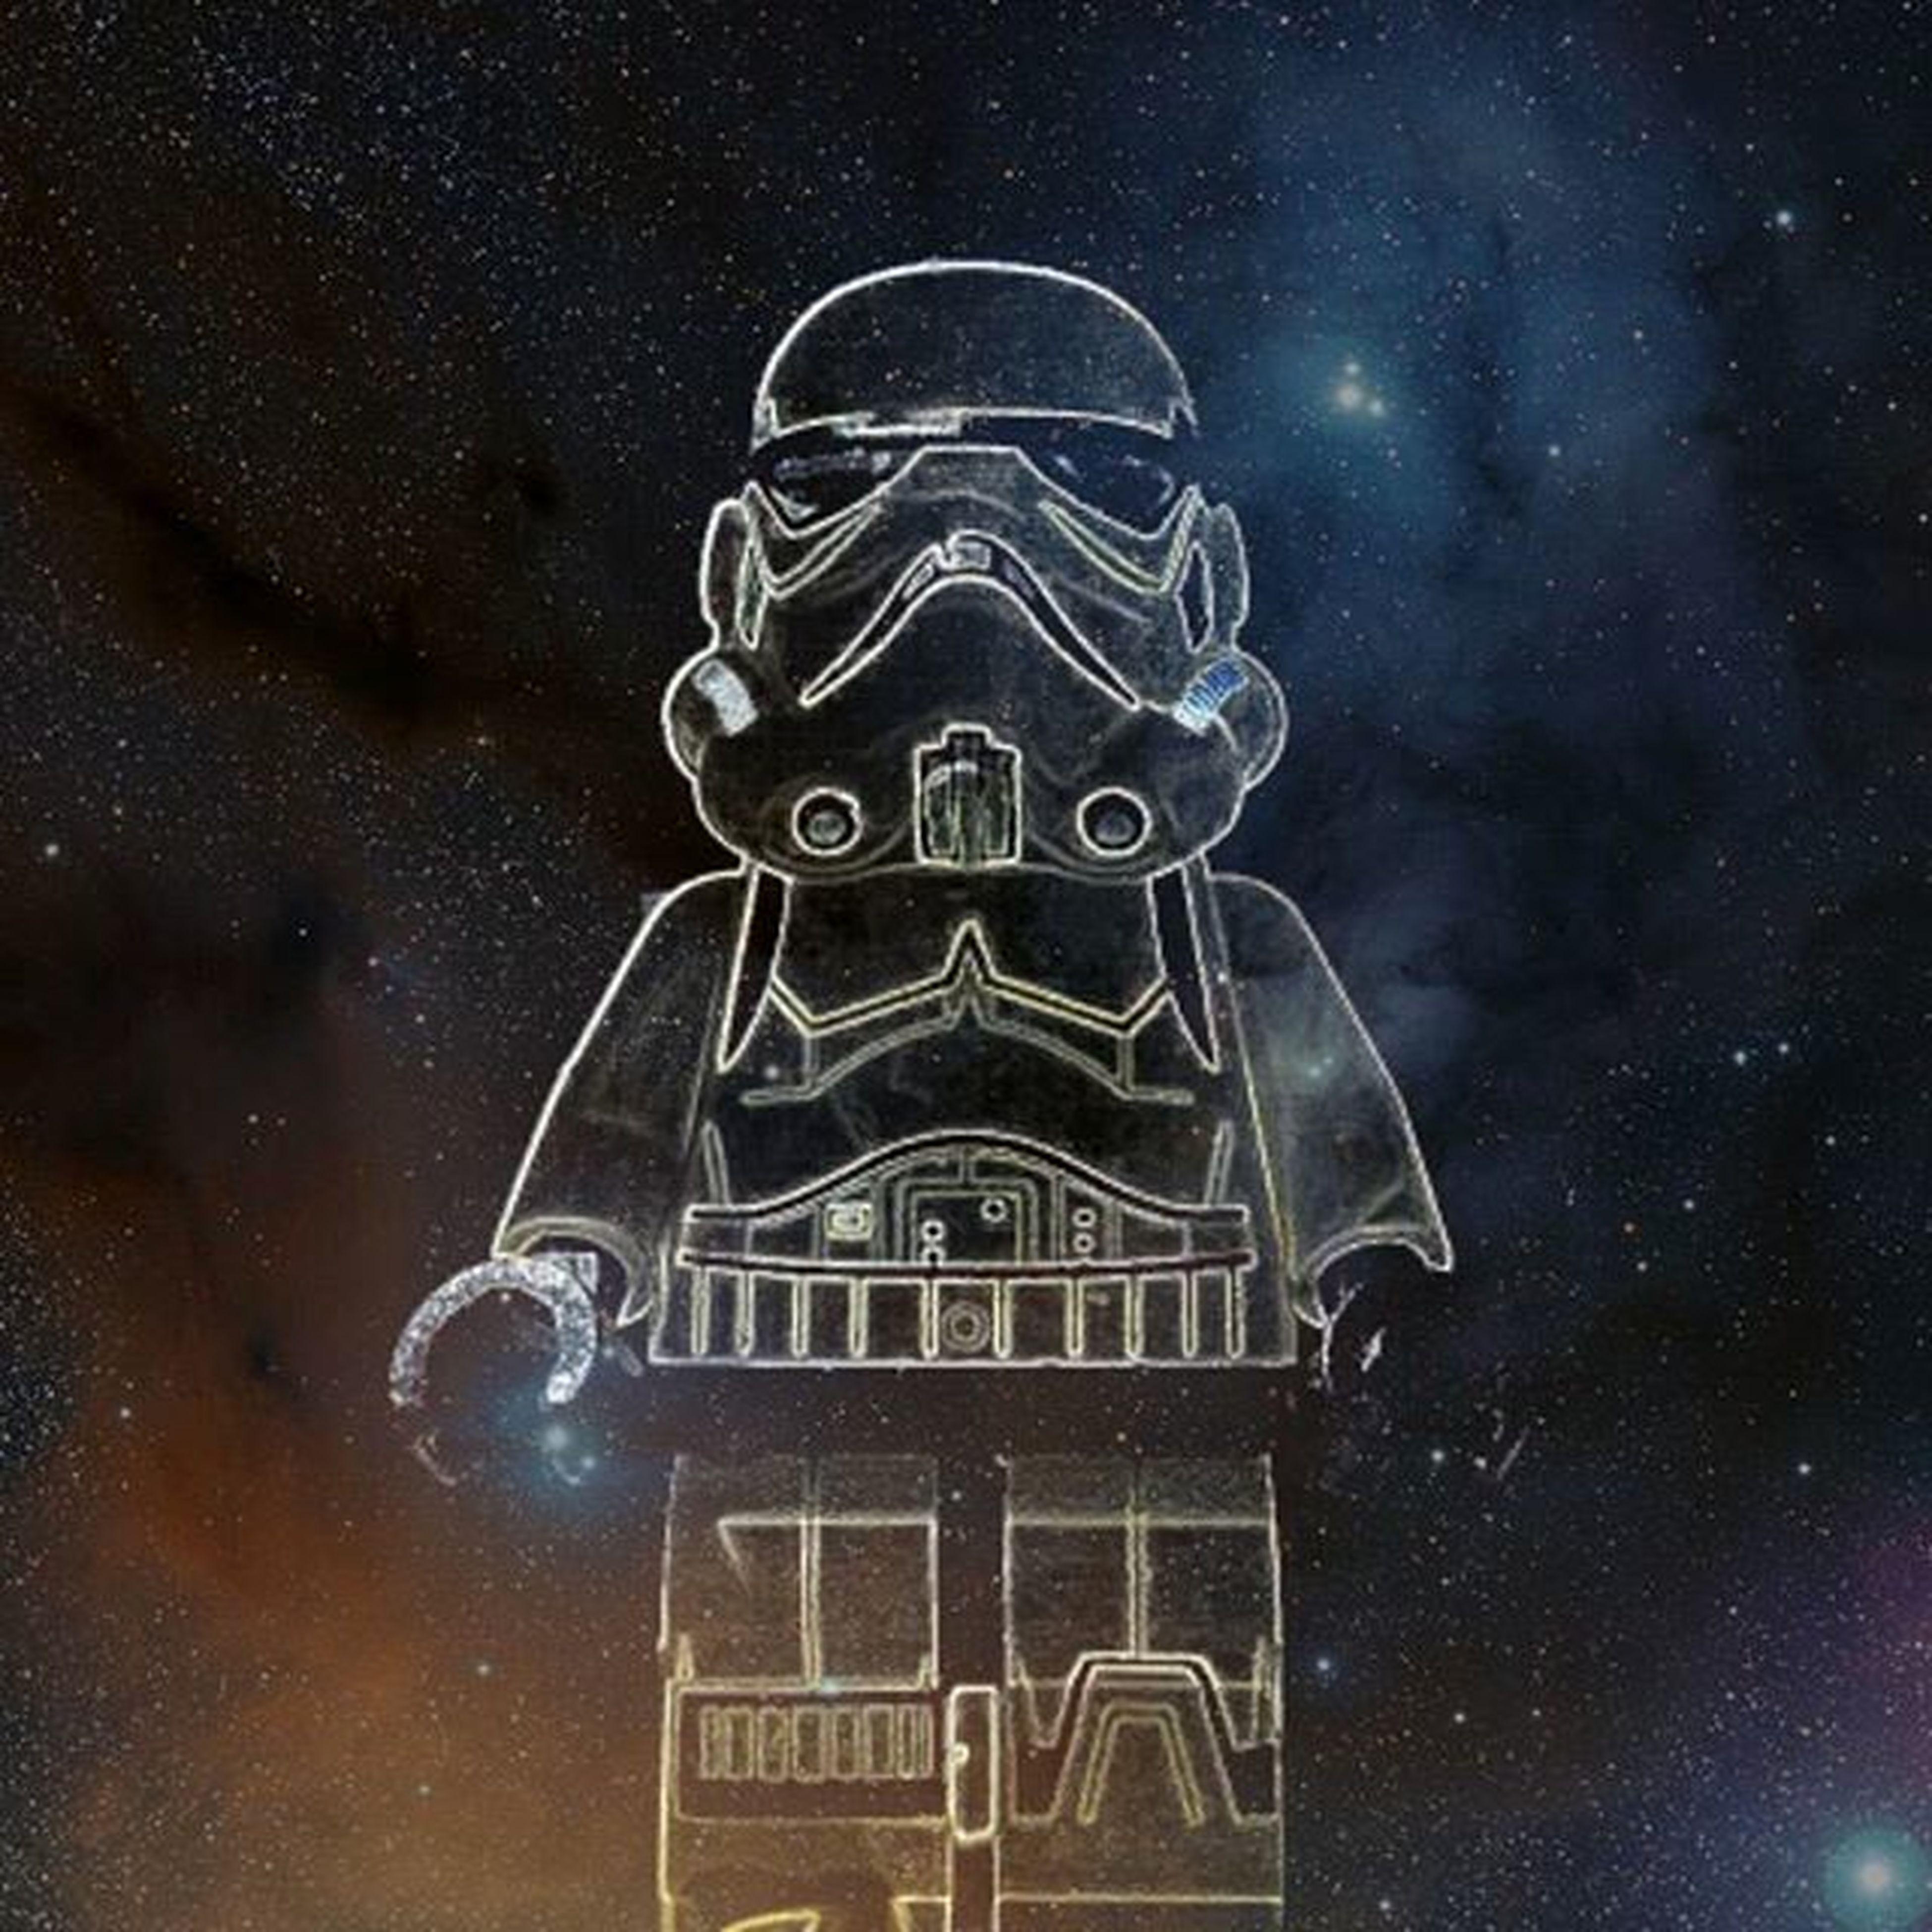 Tron Trooper Stormtrooper Neon Daftpunk  Robot Electo Legostarwars Legography Abstract Glow Retro Edit Stars Galaxy Spacefxonetouchandroid Brickify LEGO Cool Instalego Digitalart  Future Astrophotography Funky